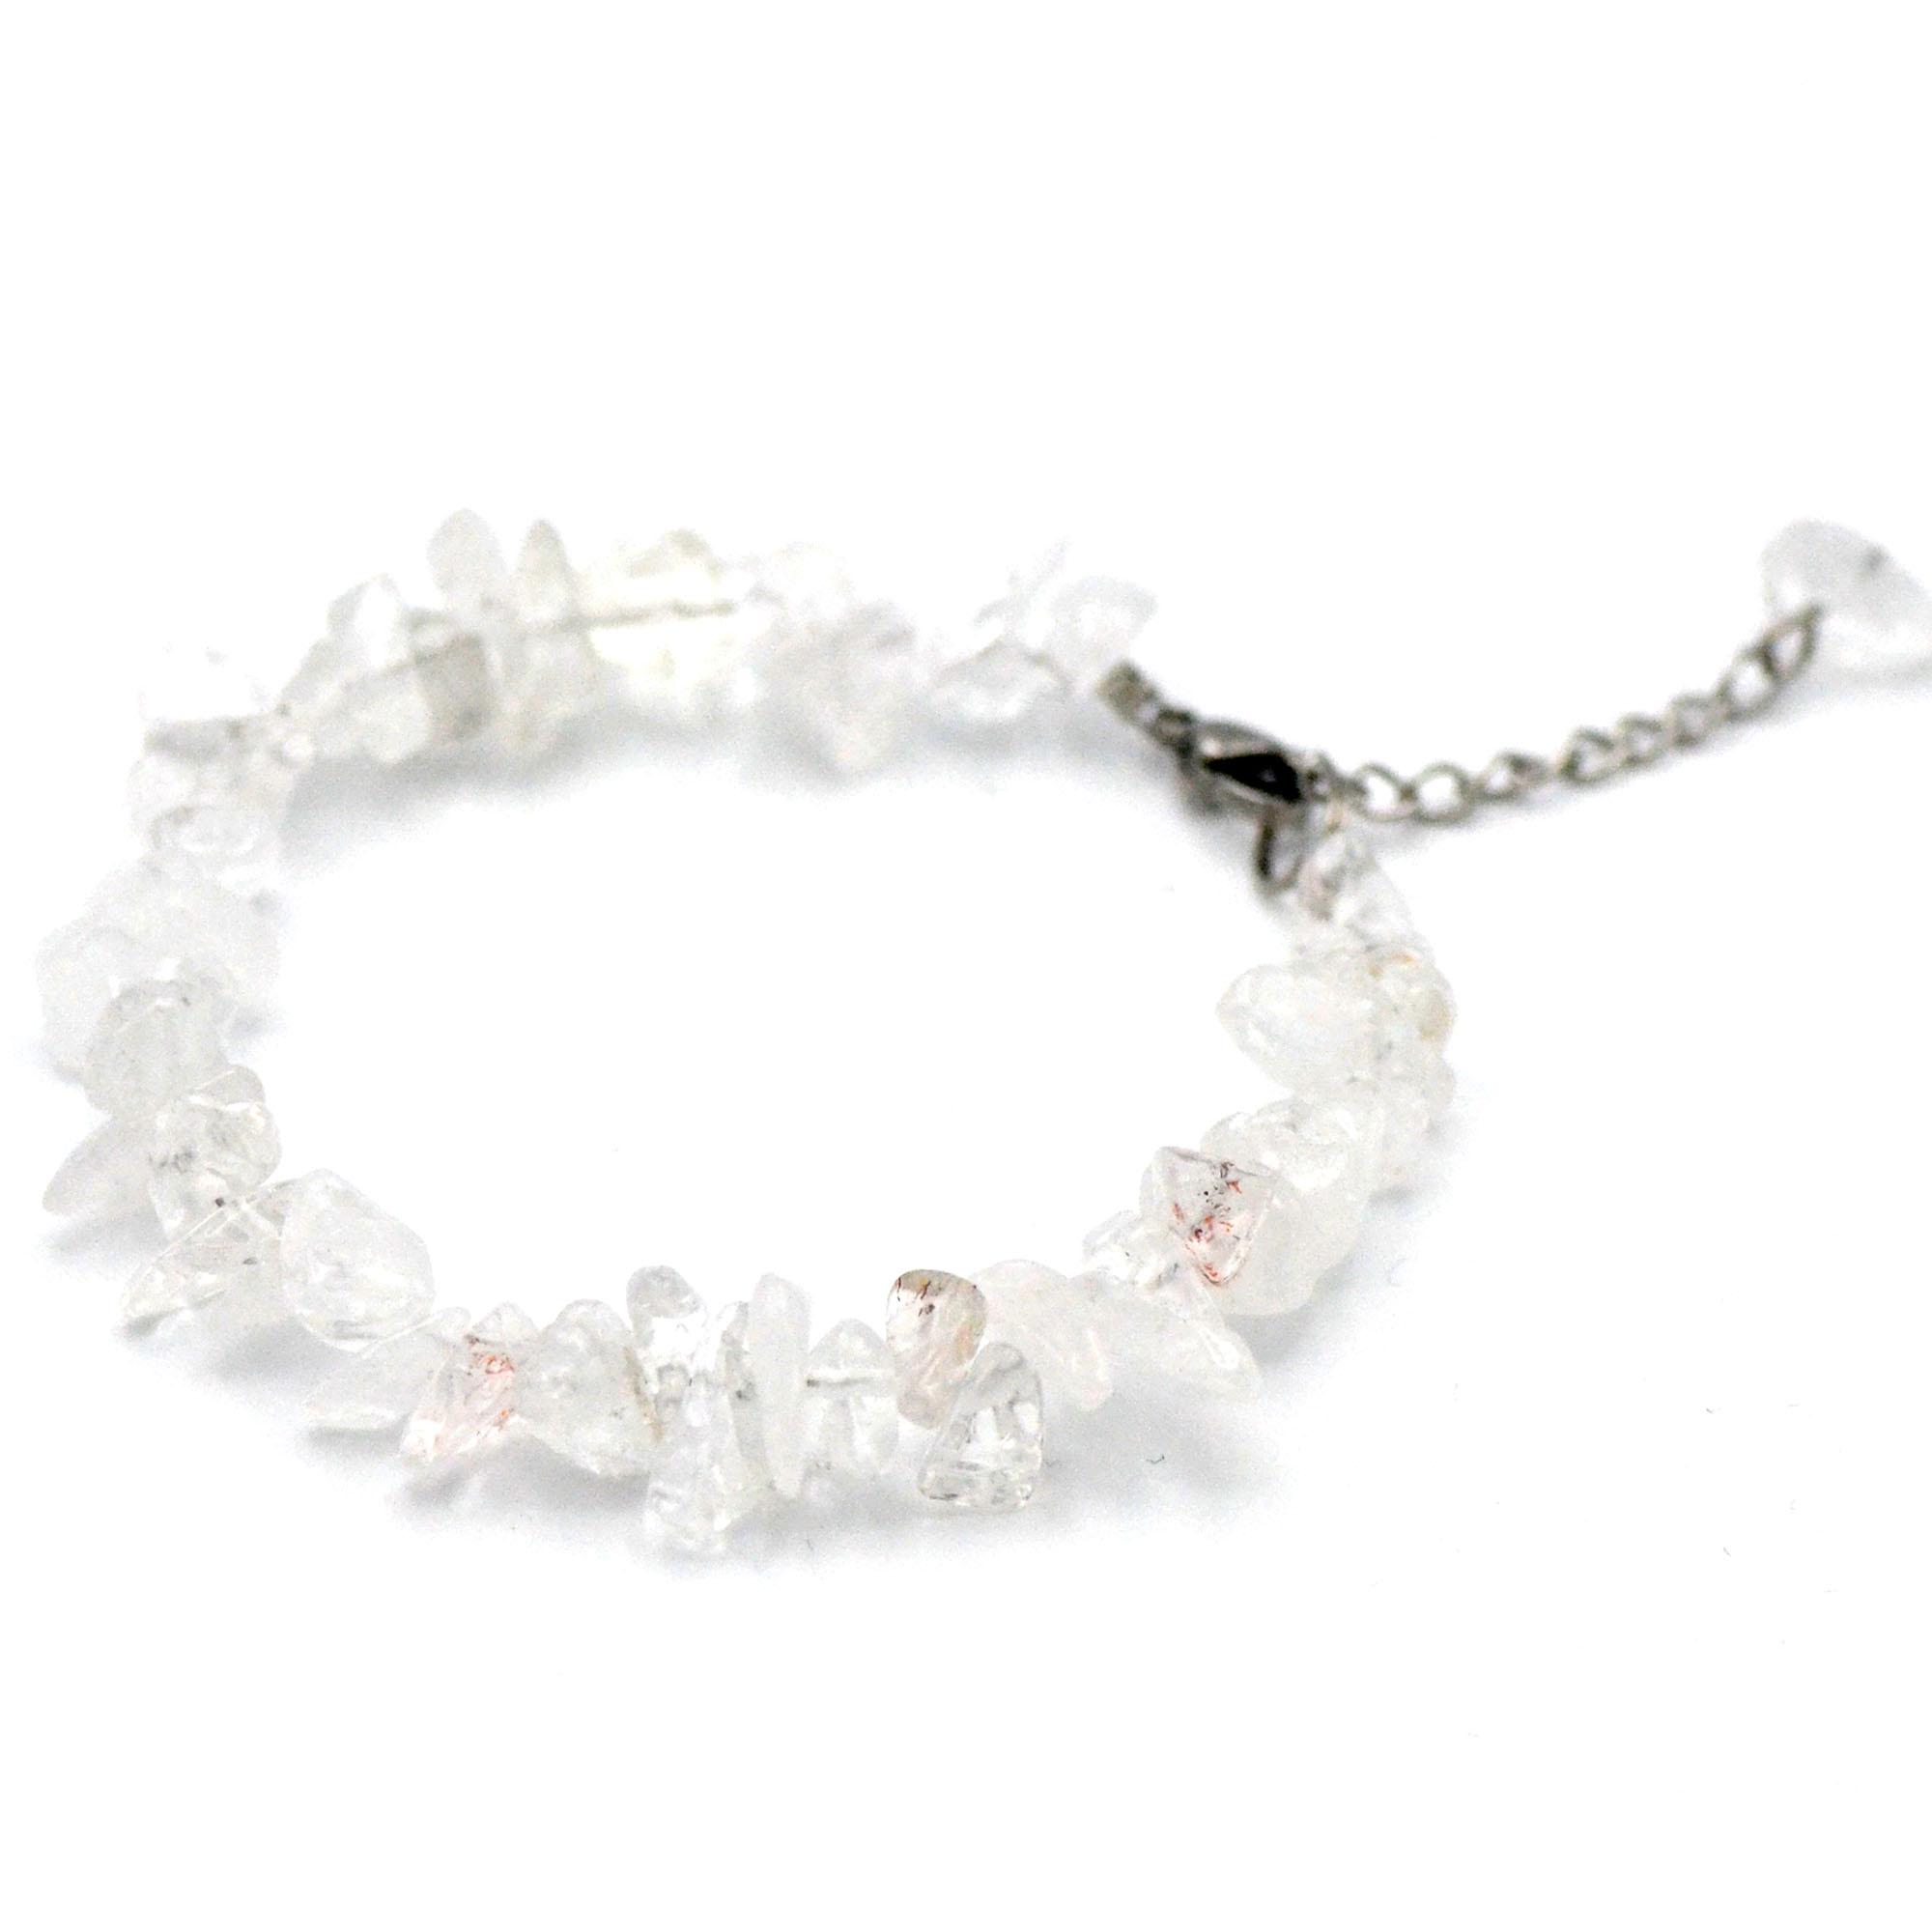 bracelet cristal de roche, perle chips avec fermoir et chainette en acier inoxydable